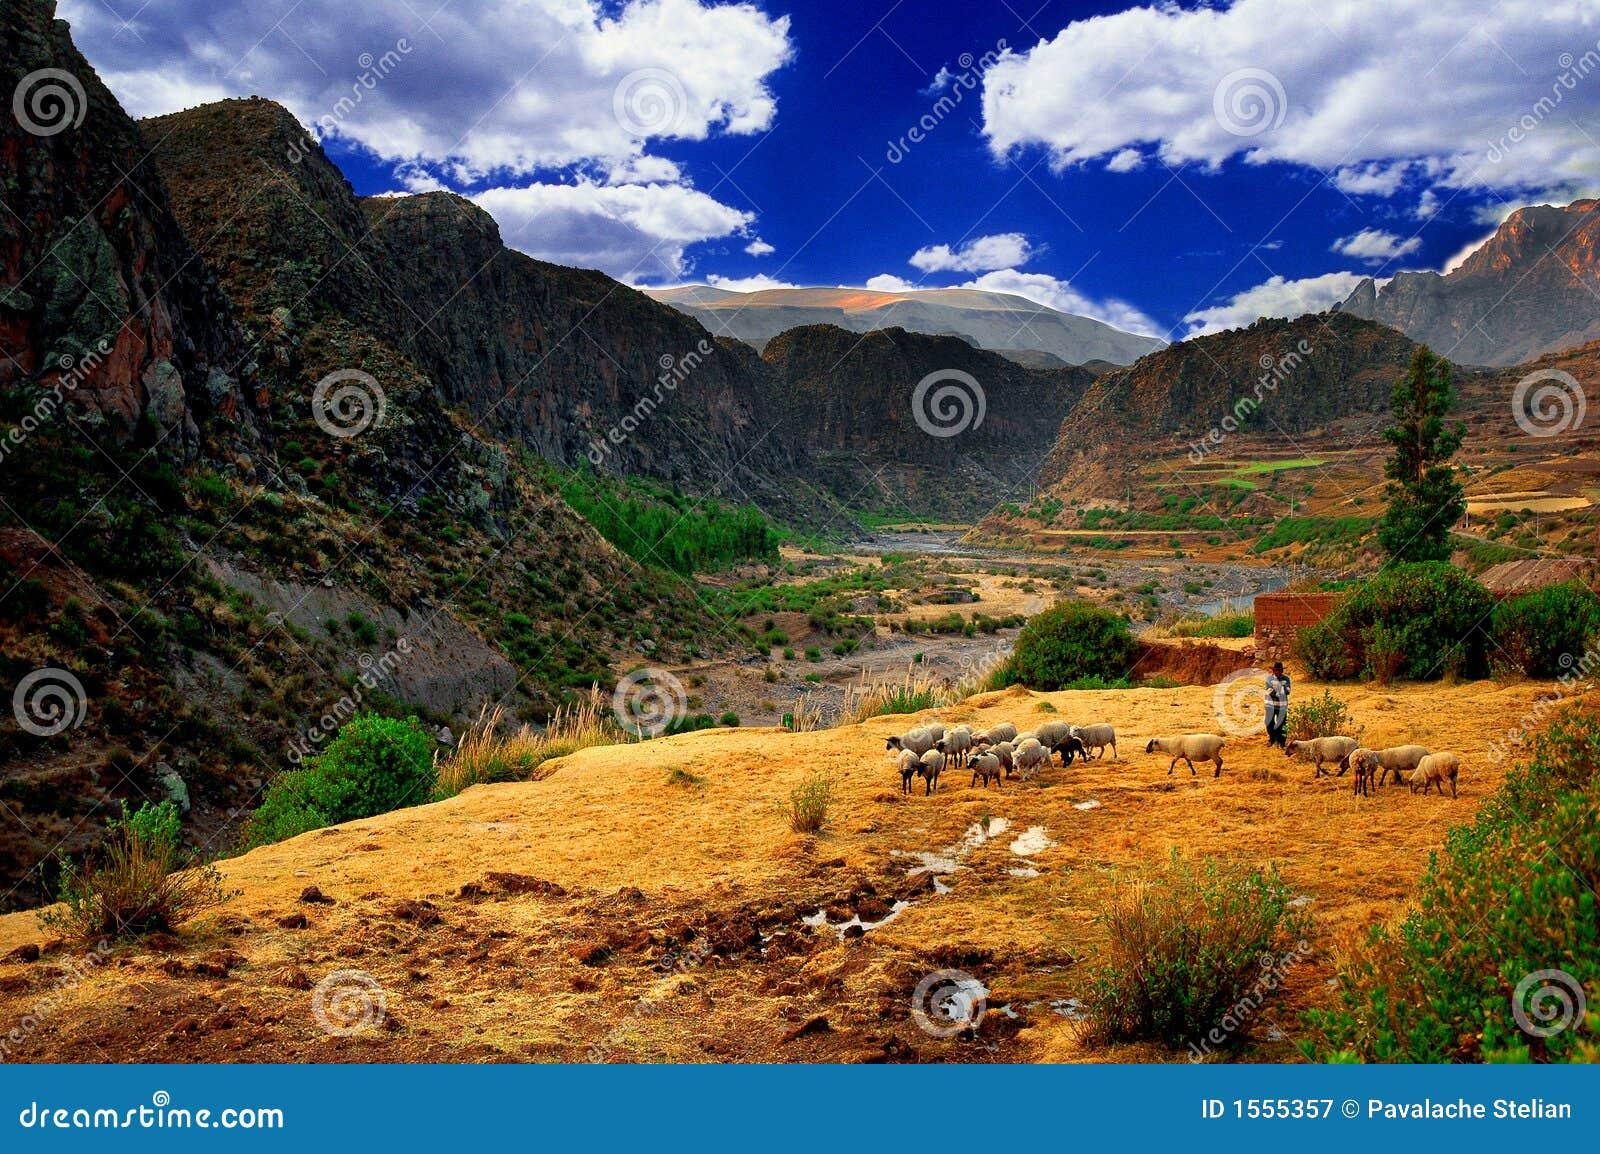 Download Colca Valley Landscape, Peru Stock Image - Image of inca, colorful: 1555357